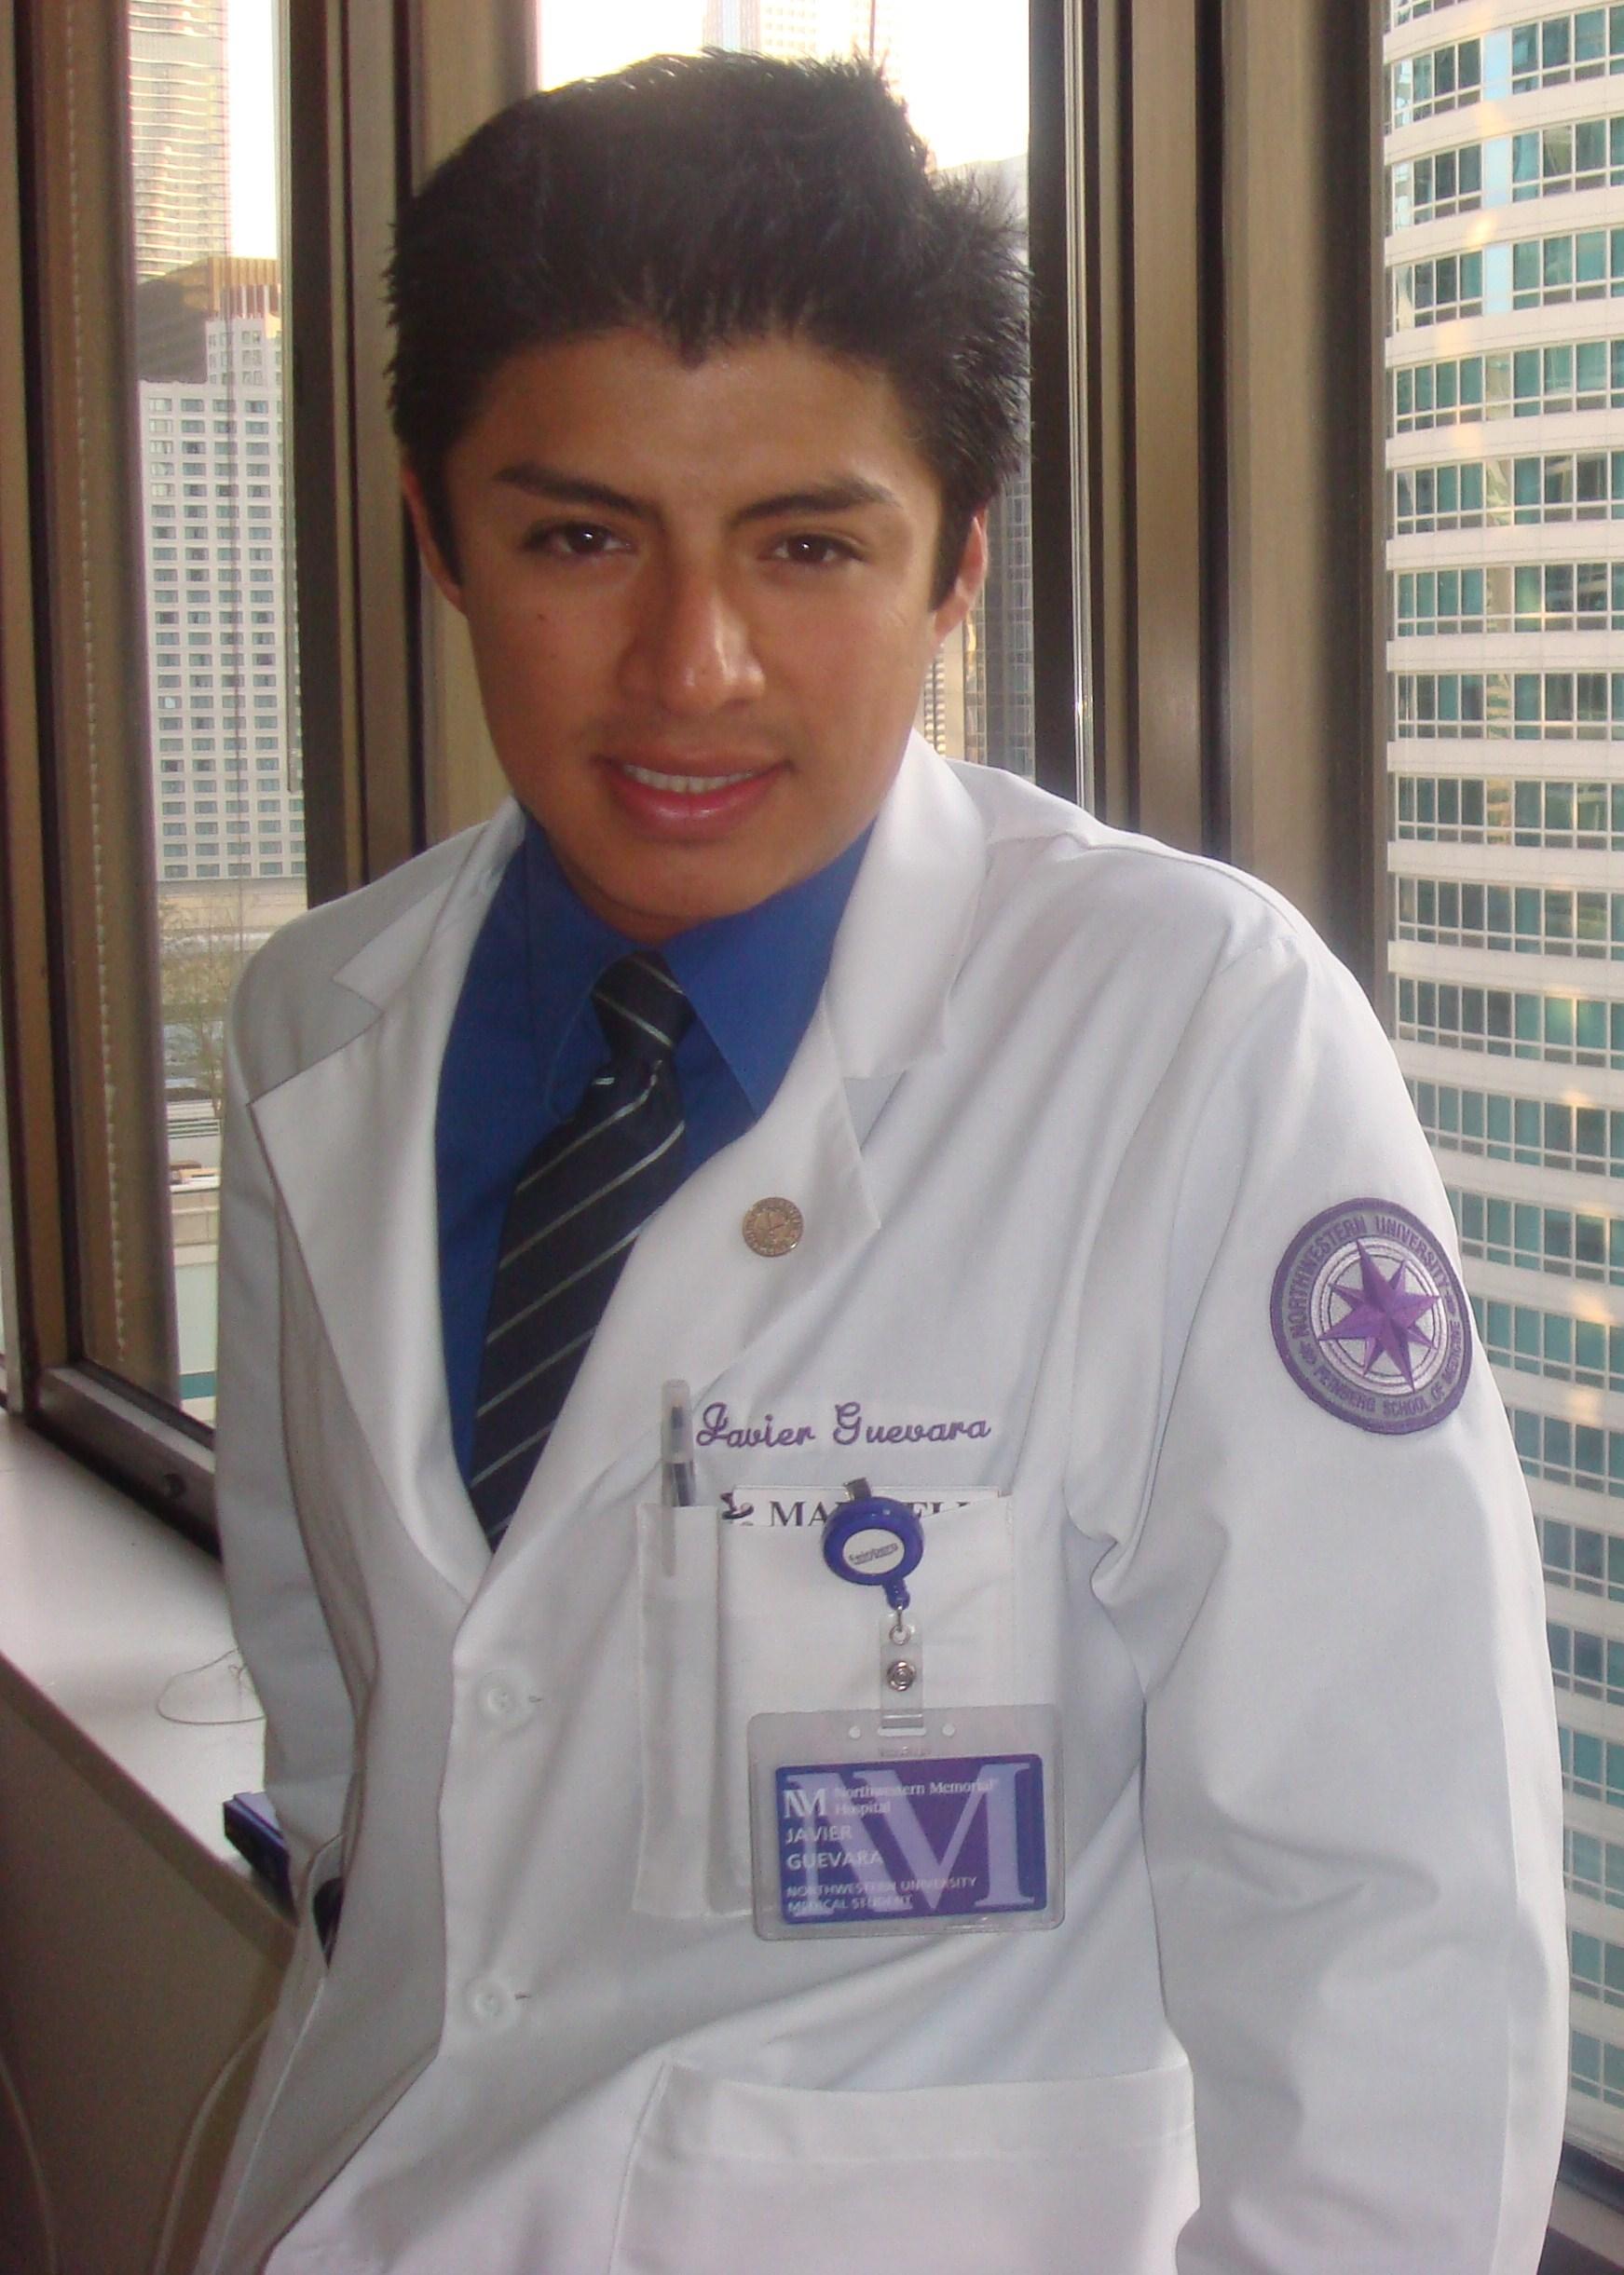 Javier - Student 6